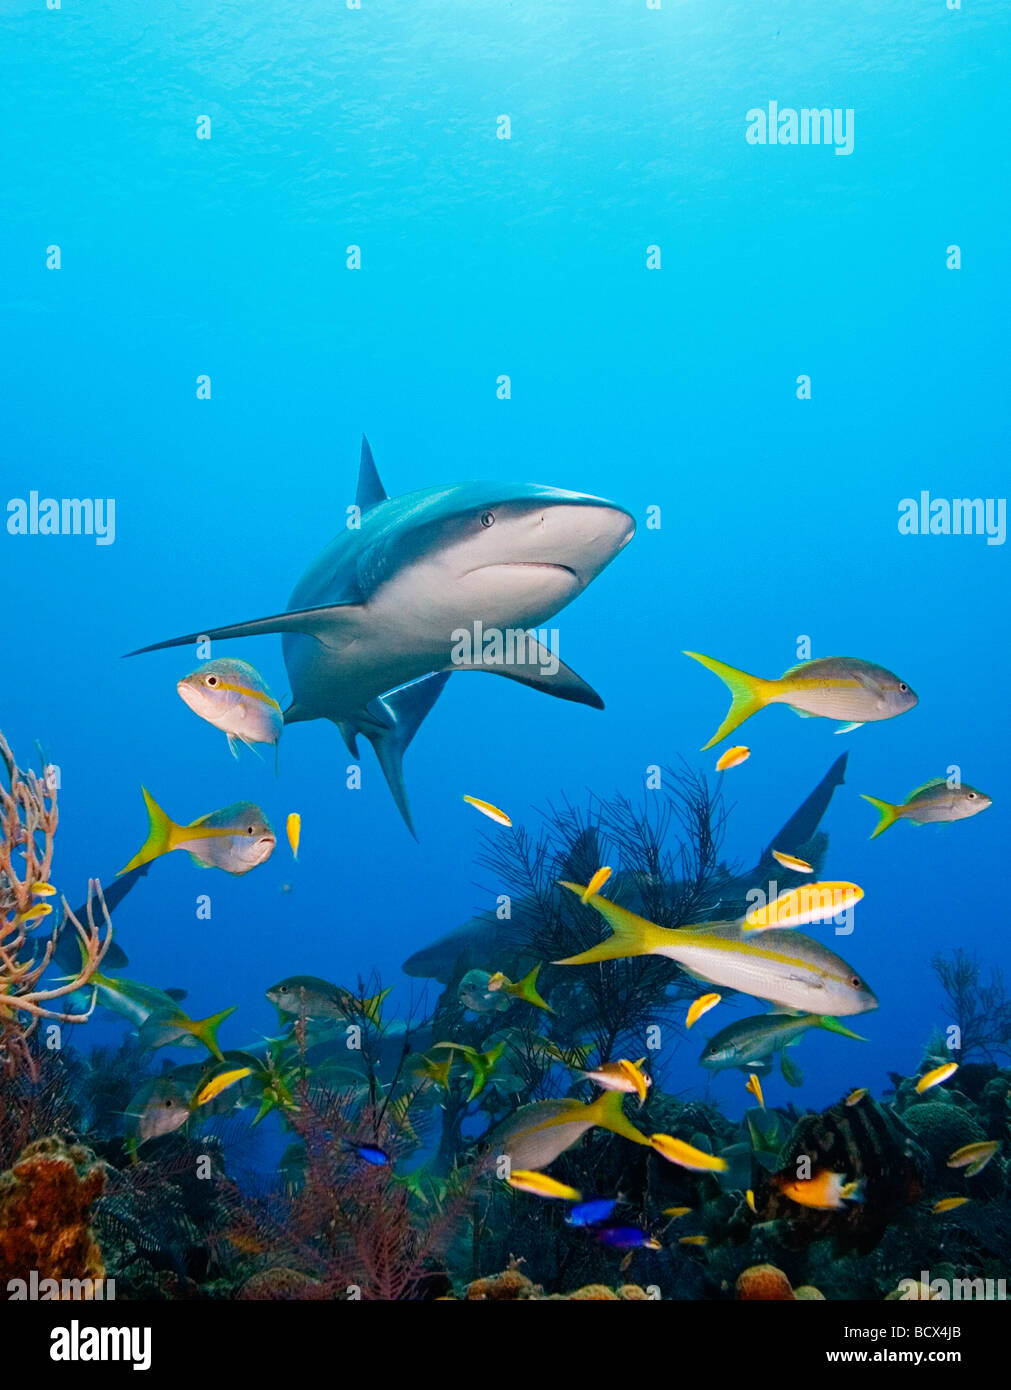 Caribbean Reef Sharks over coral reef Carcharhinus perezi West End Atlantic Ocean Bahamas USA - Stock Image